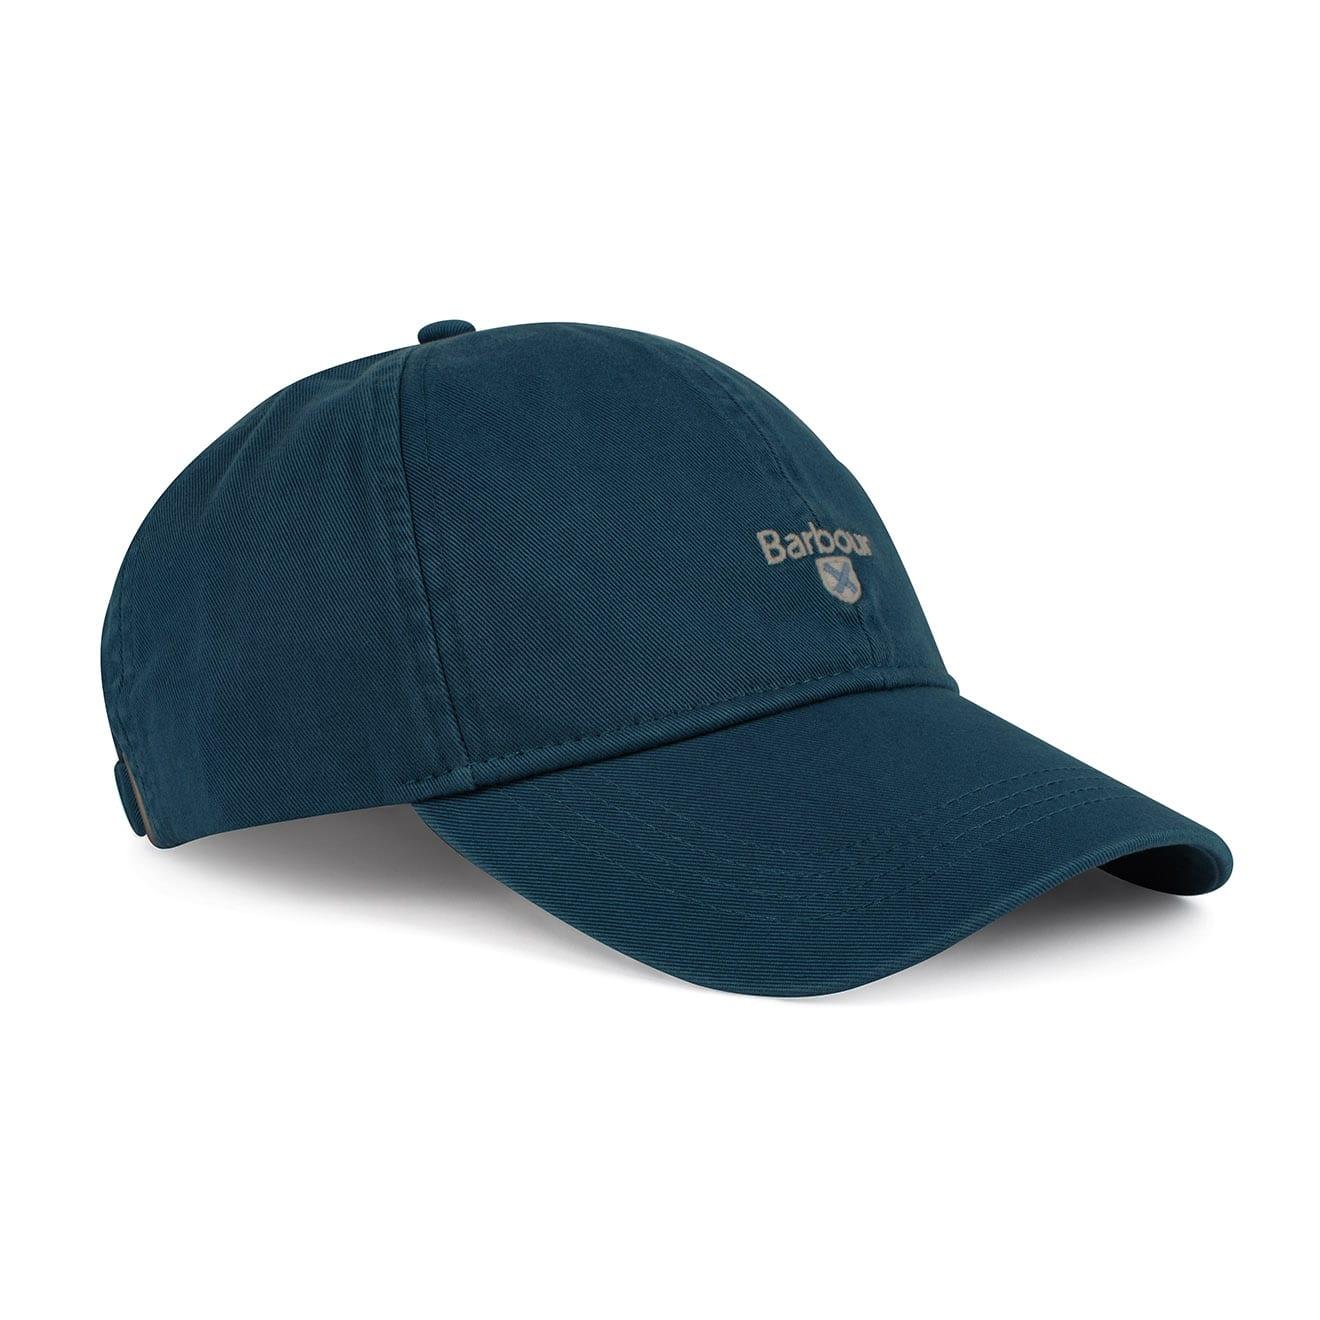 Barbour Cascade Sports Cap Steel Blue